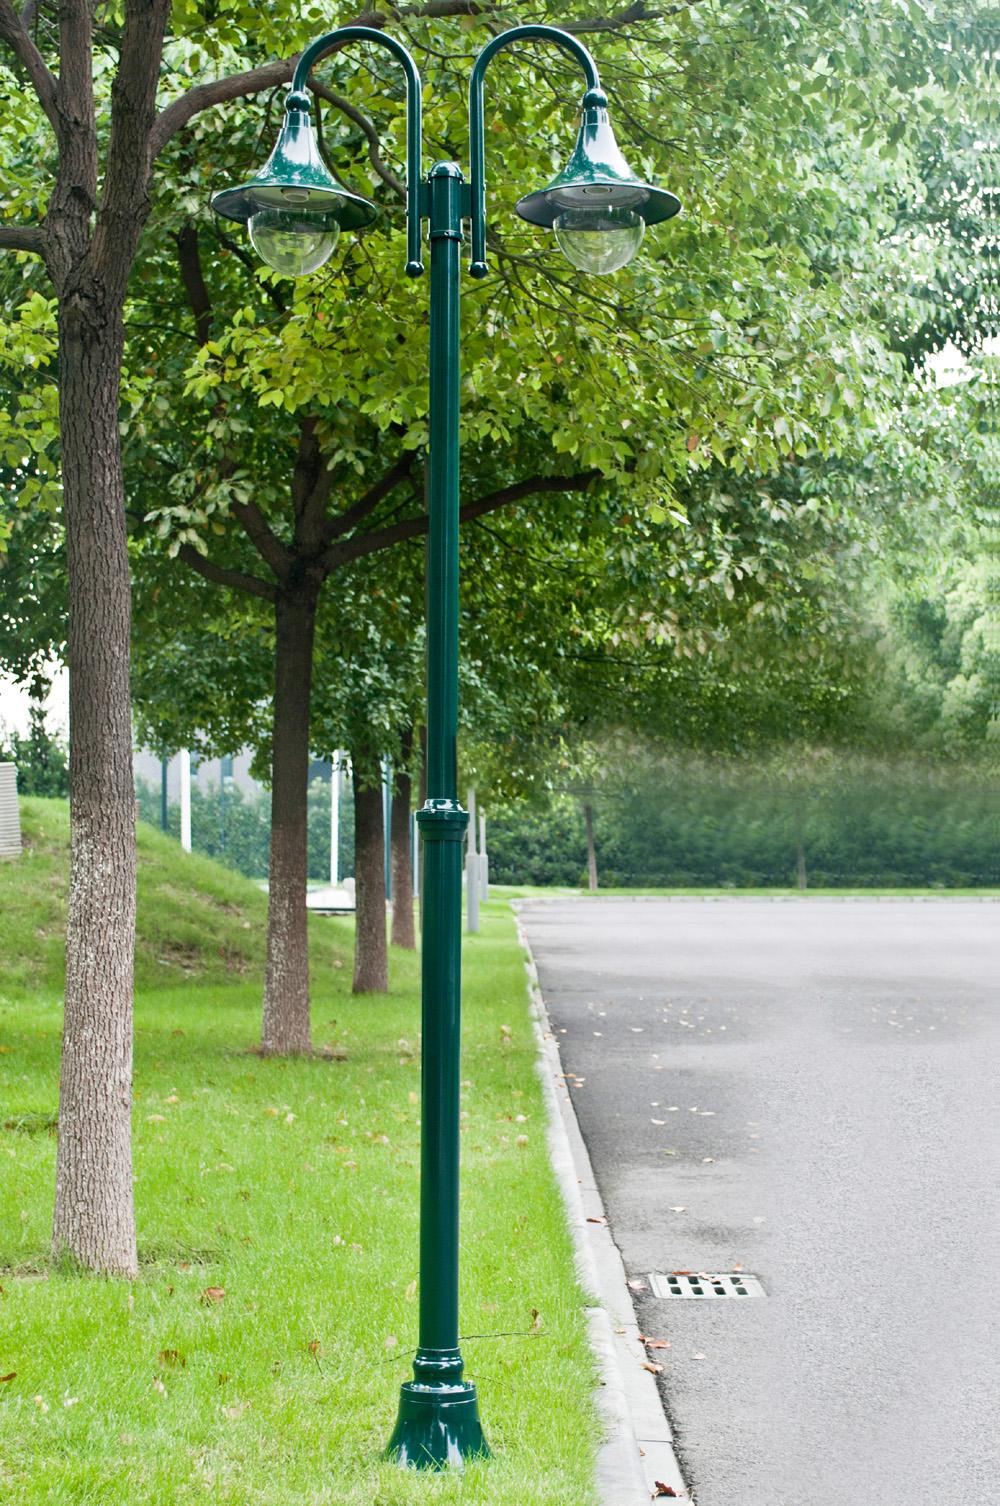 Lampadaire vert lampe jardin ext rieur 2 t tes - Lampe exterieur jardin ...